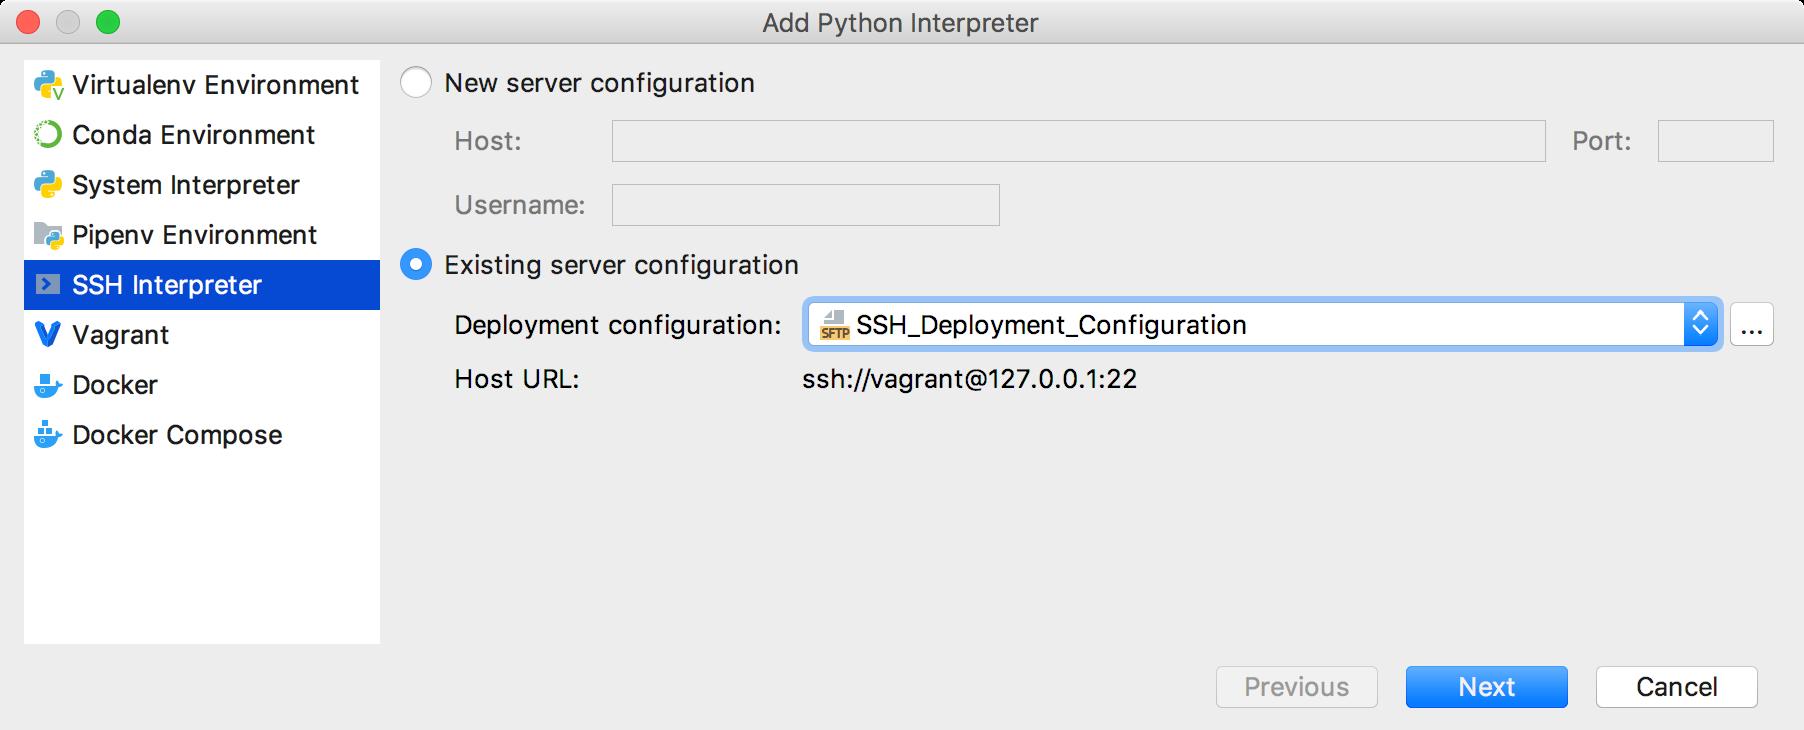 Existing SSH configuration